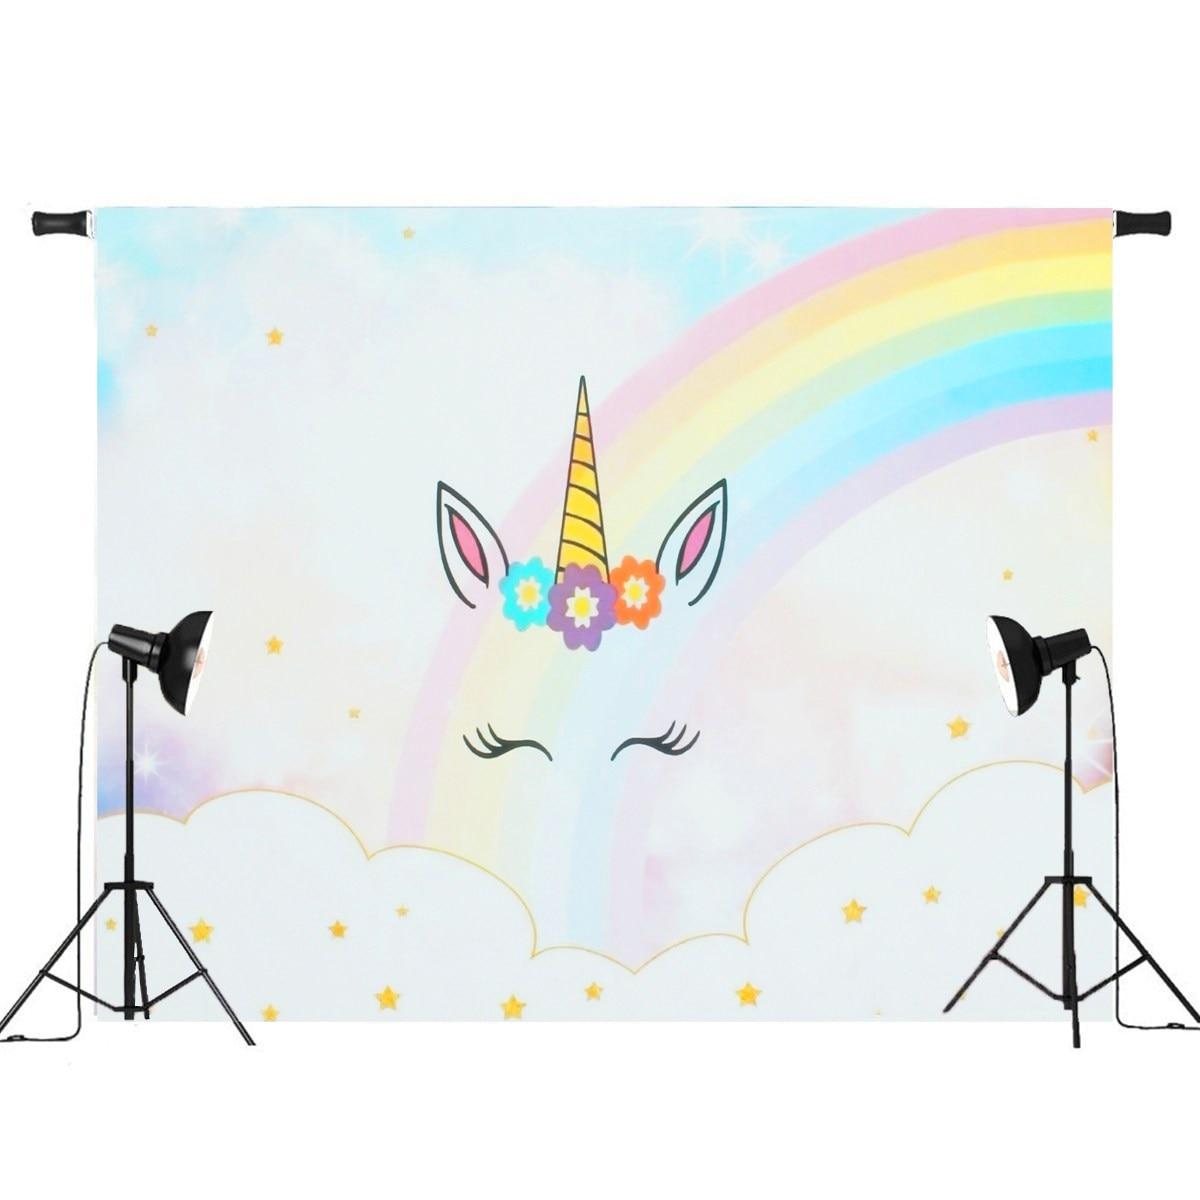 7x5ft/5x3ft Arco Iris nubes cielo para unicornio niños foto fondos Studio props 2018 nueva llegada